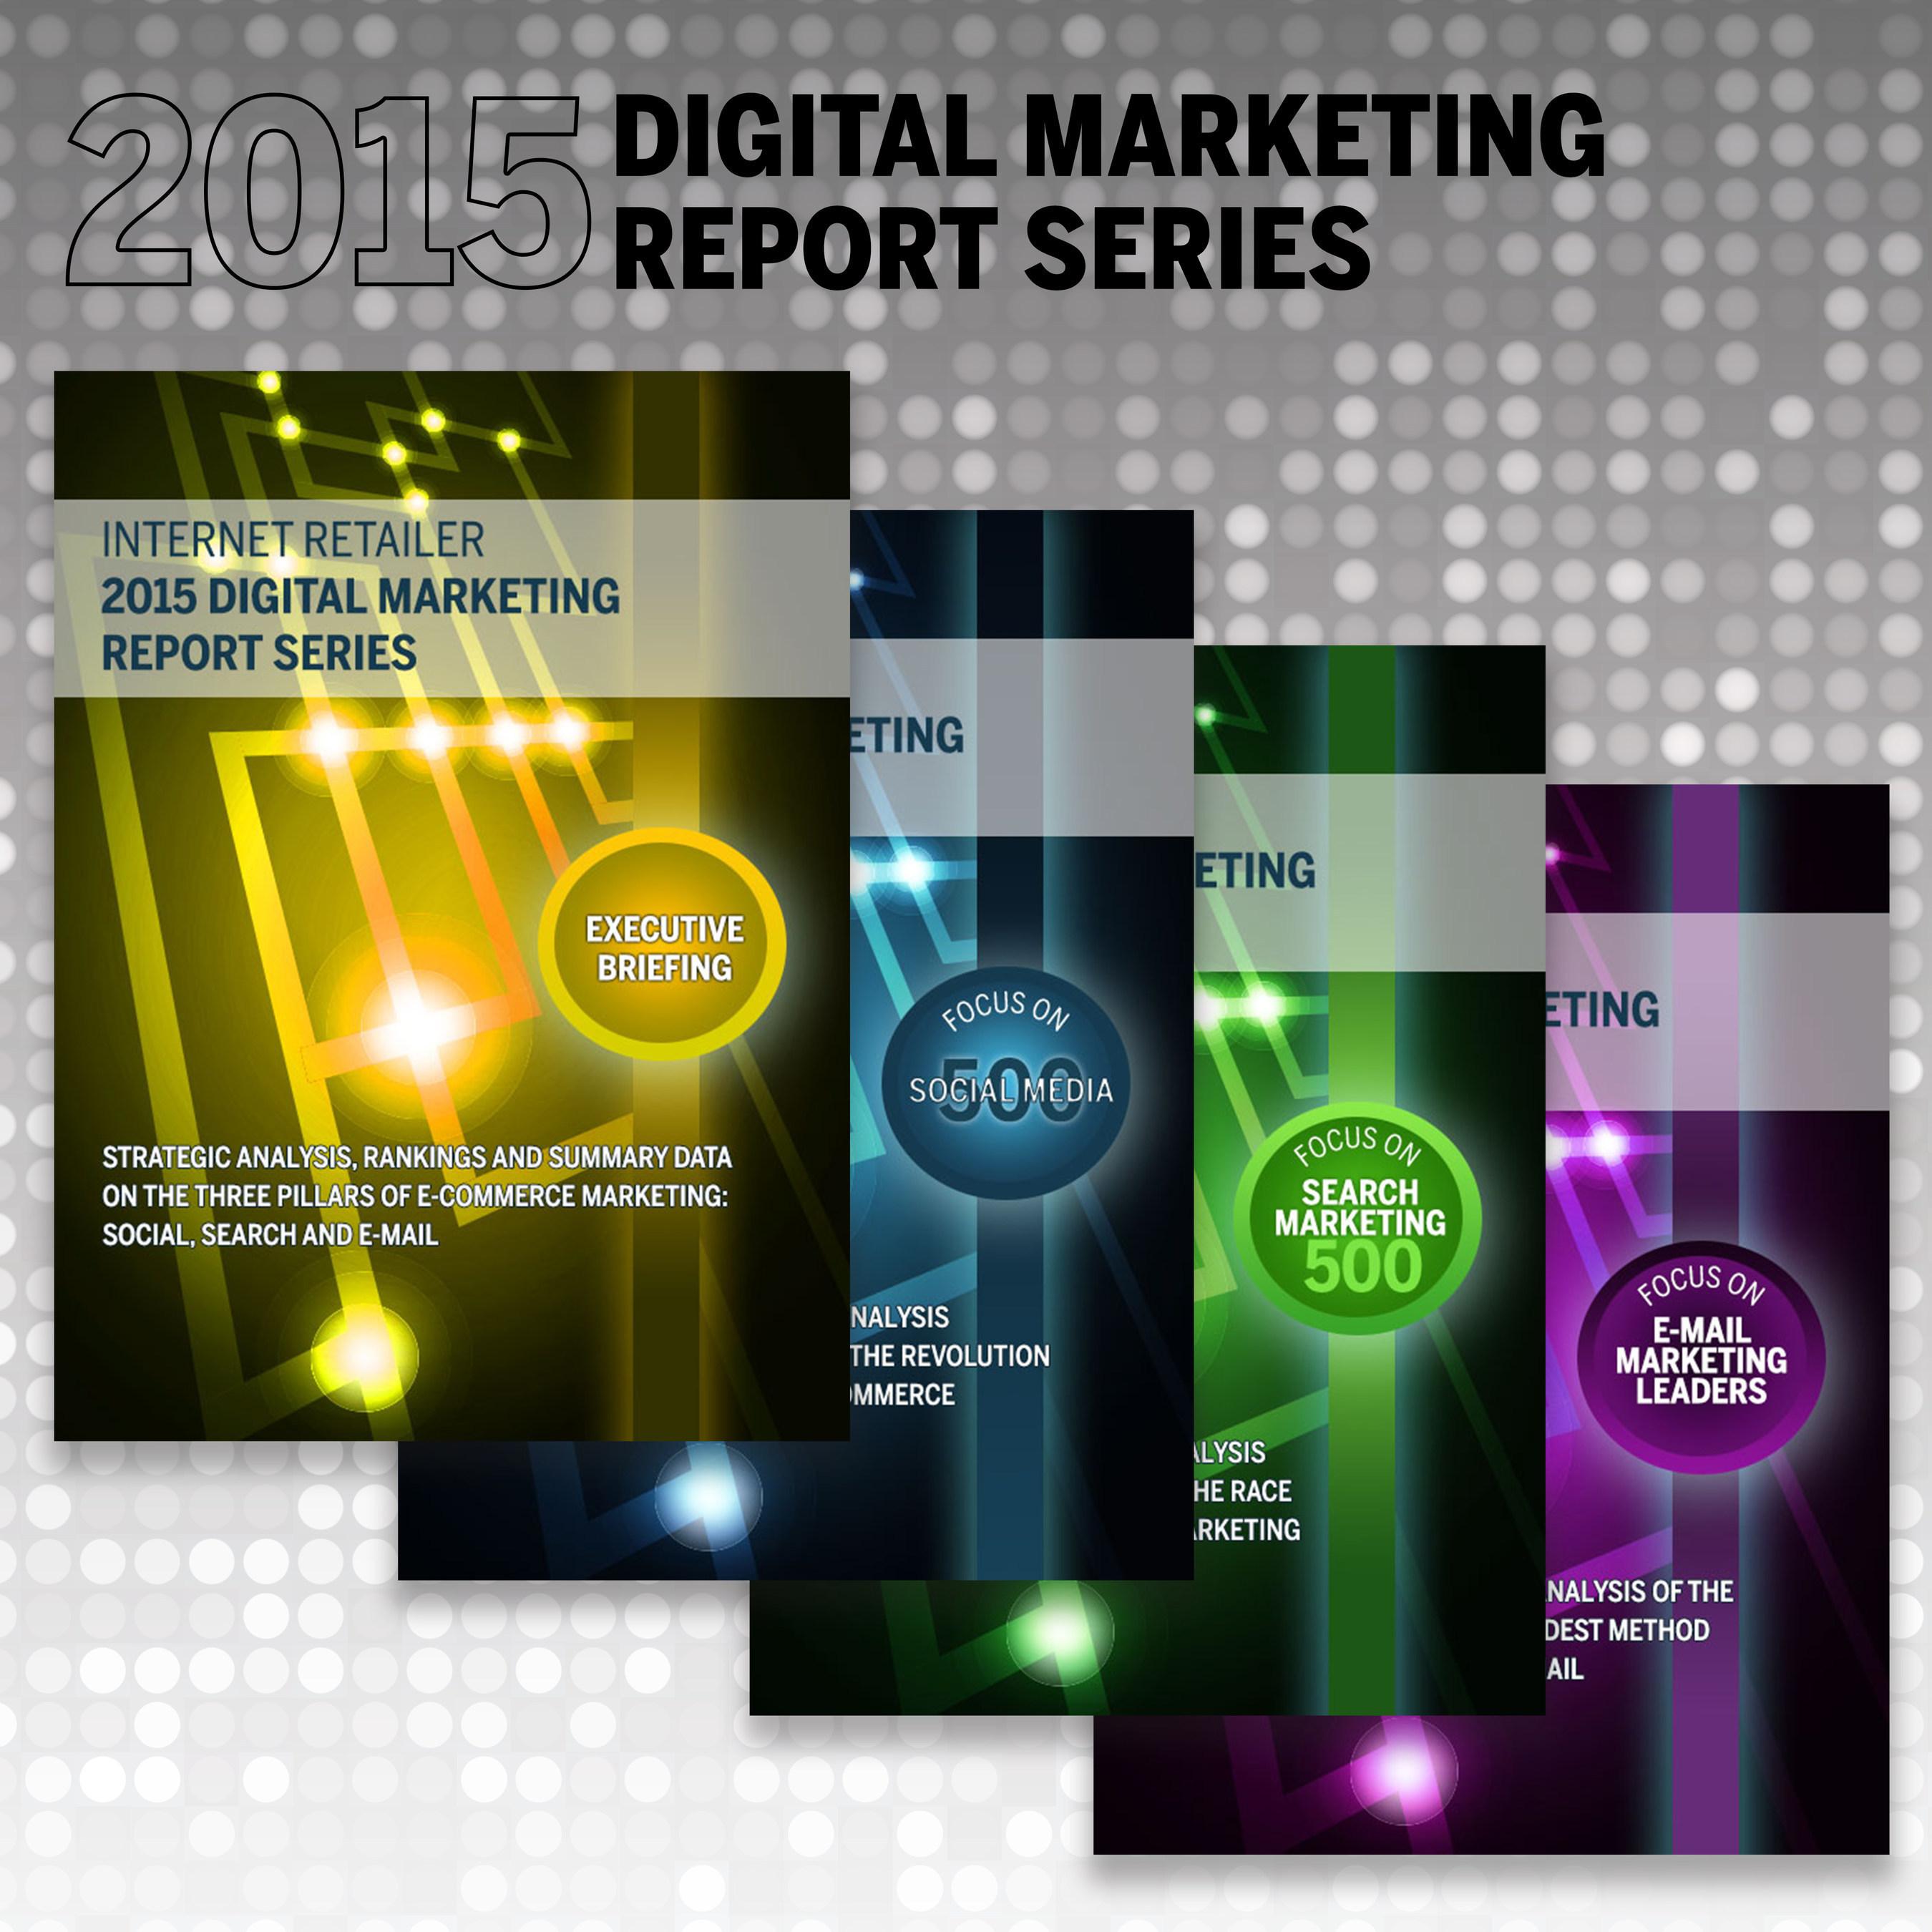 Amazon Upped Its Digital Marketing Spend 40% Last Year to $2.8 Billion